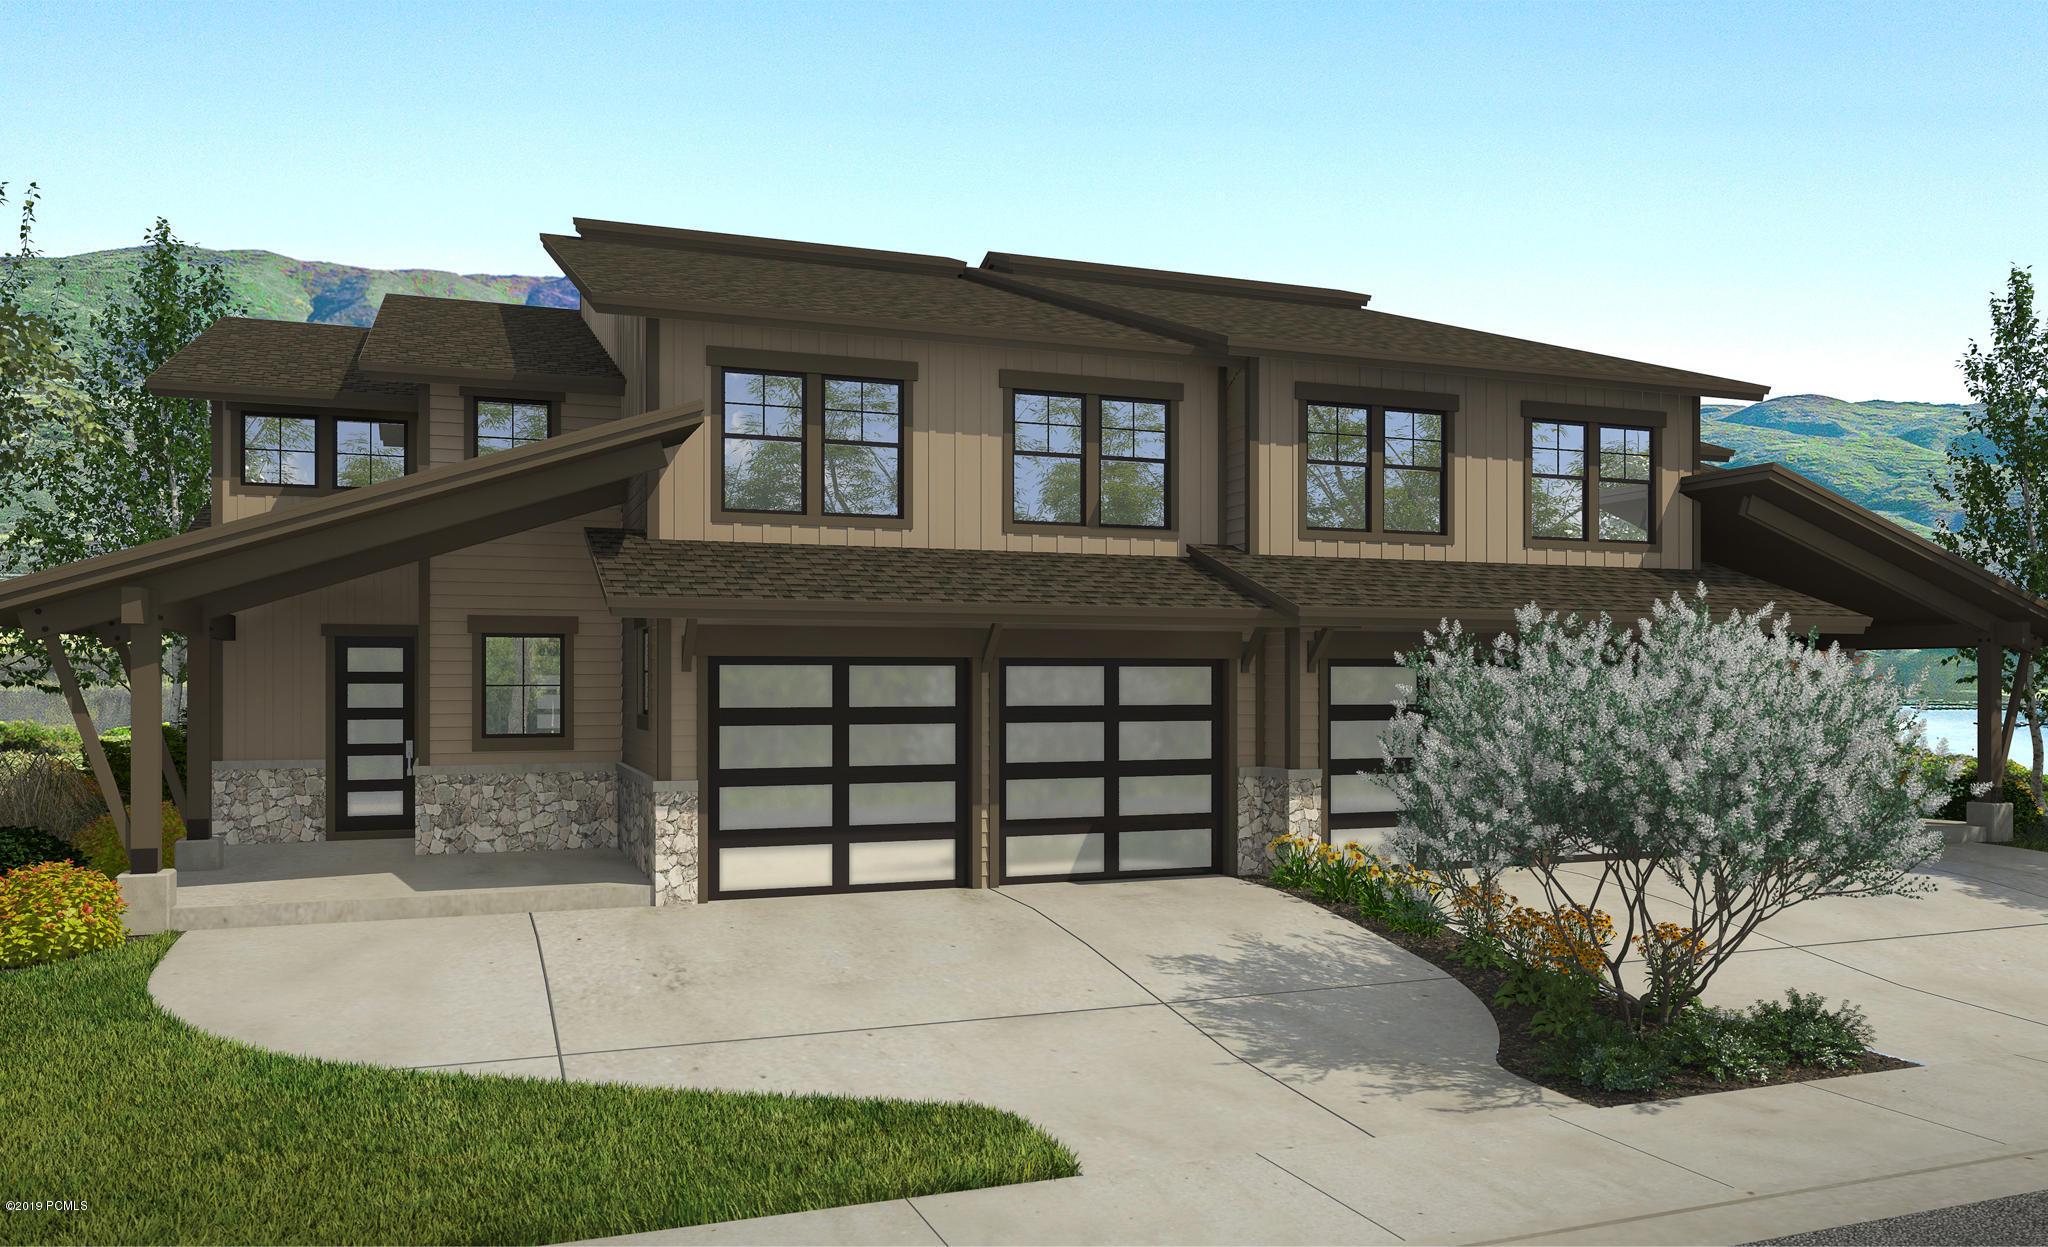 9939 Meer Circle, Heber City, Utah 84032, 4 Bedrooms Bedrooms, ,4 BathroomsBathrooms,Condominium,For Sale,Meer,11908389